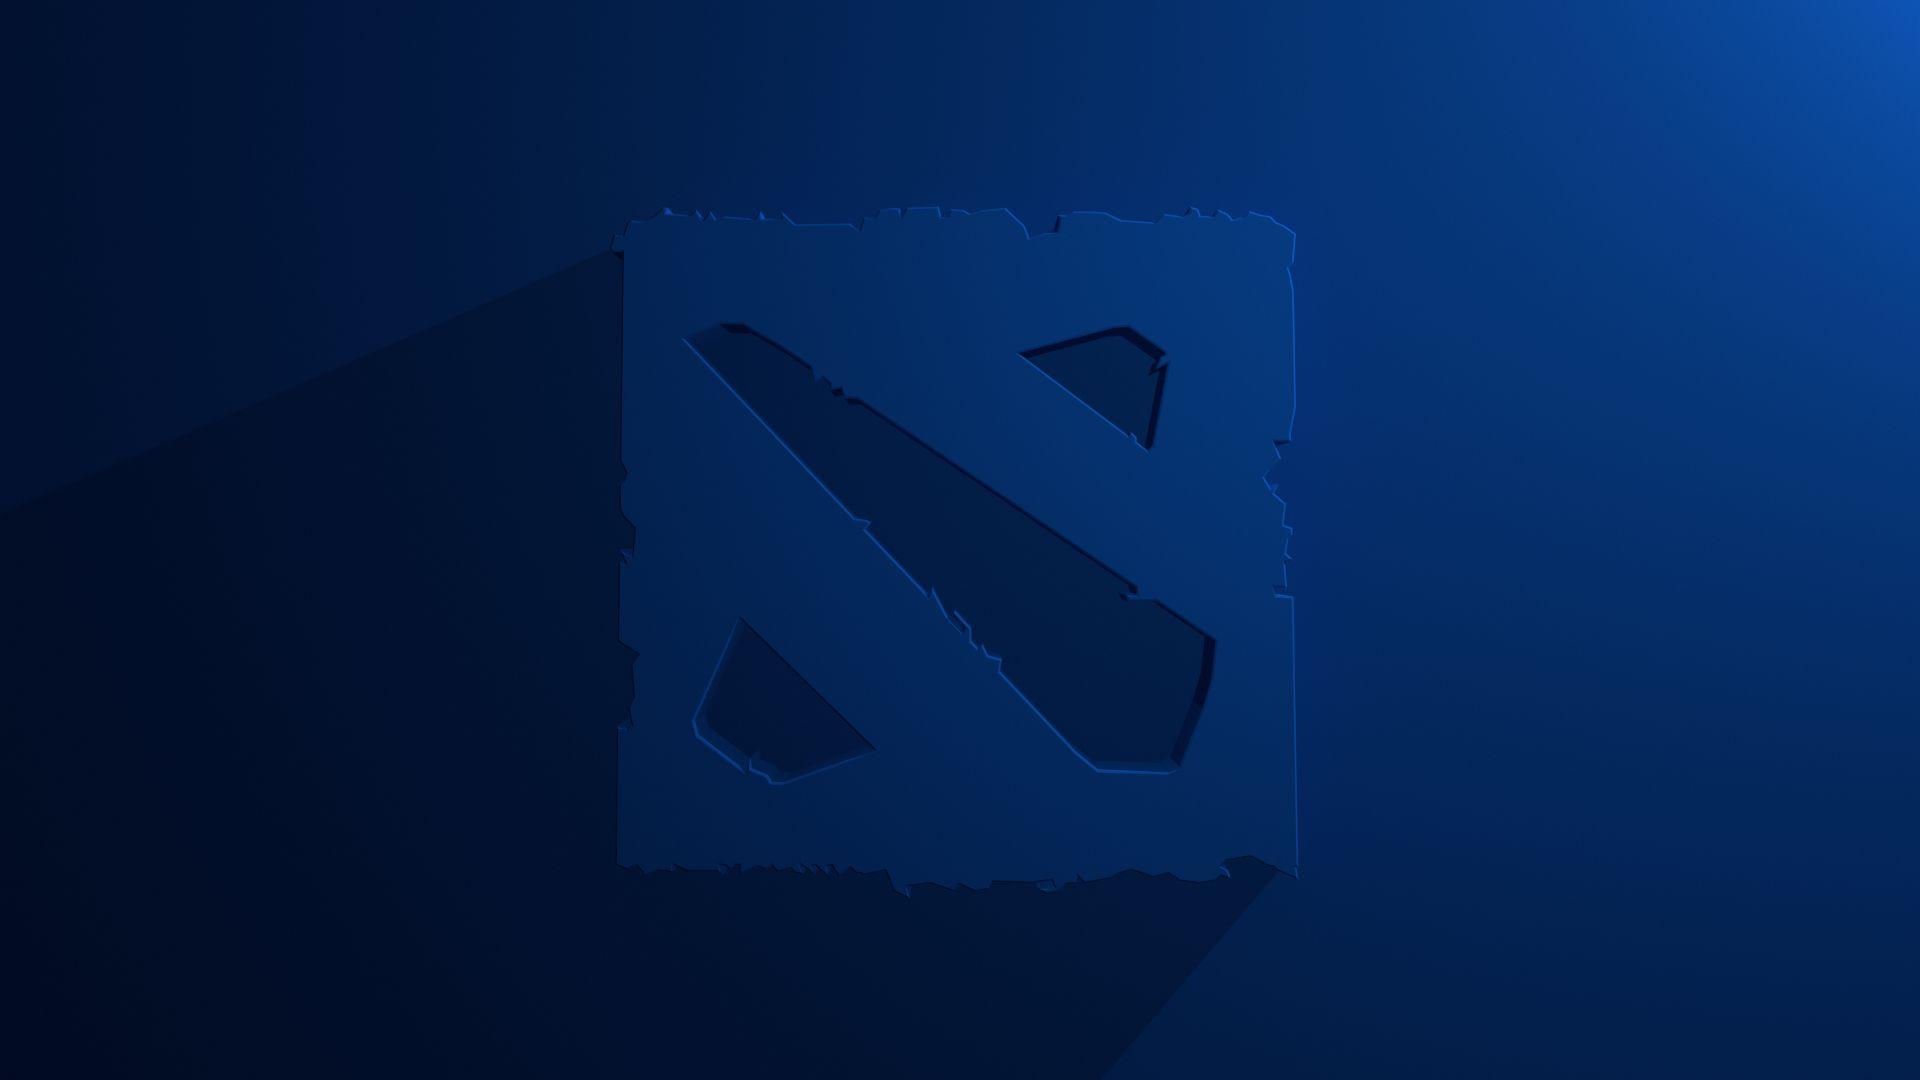 dota 2 logo minimal wallpaper more http dota2walls com misc dota